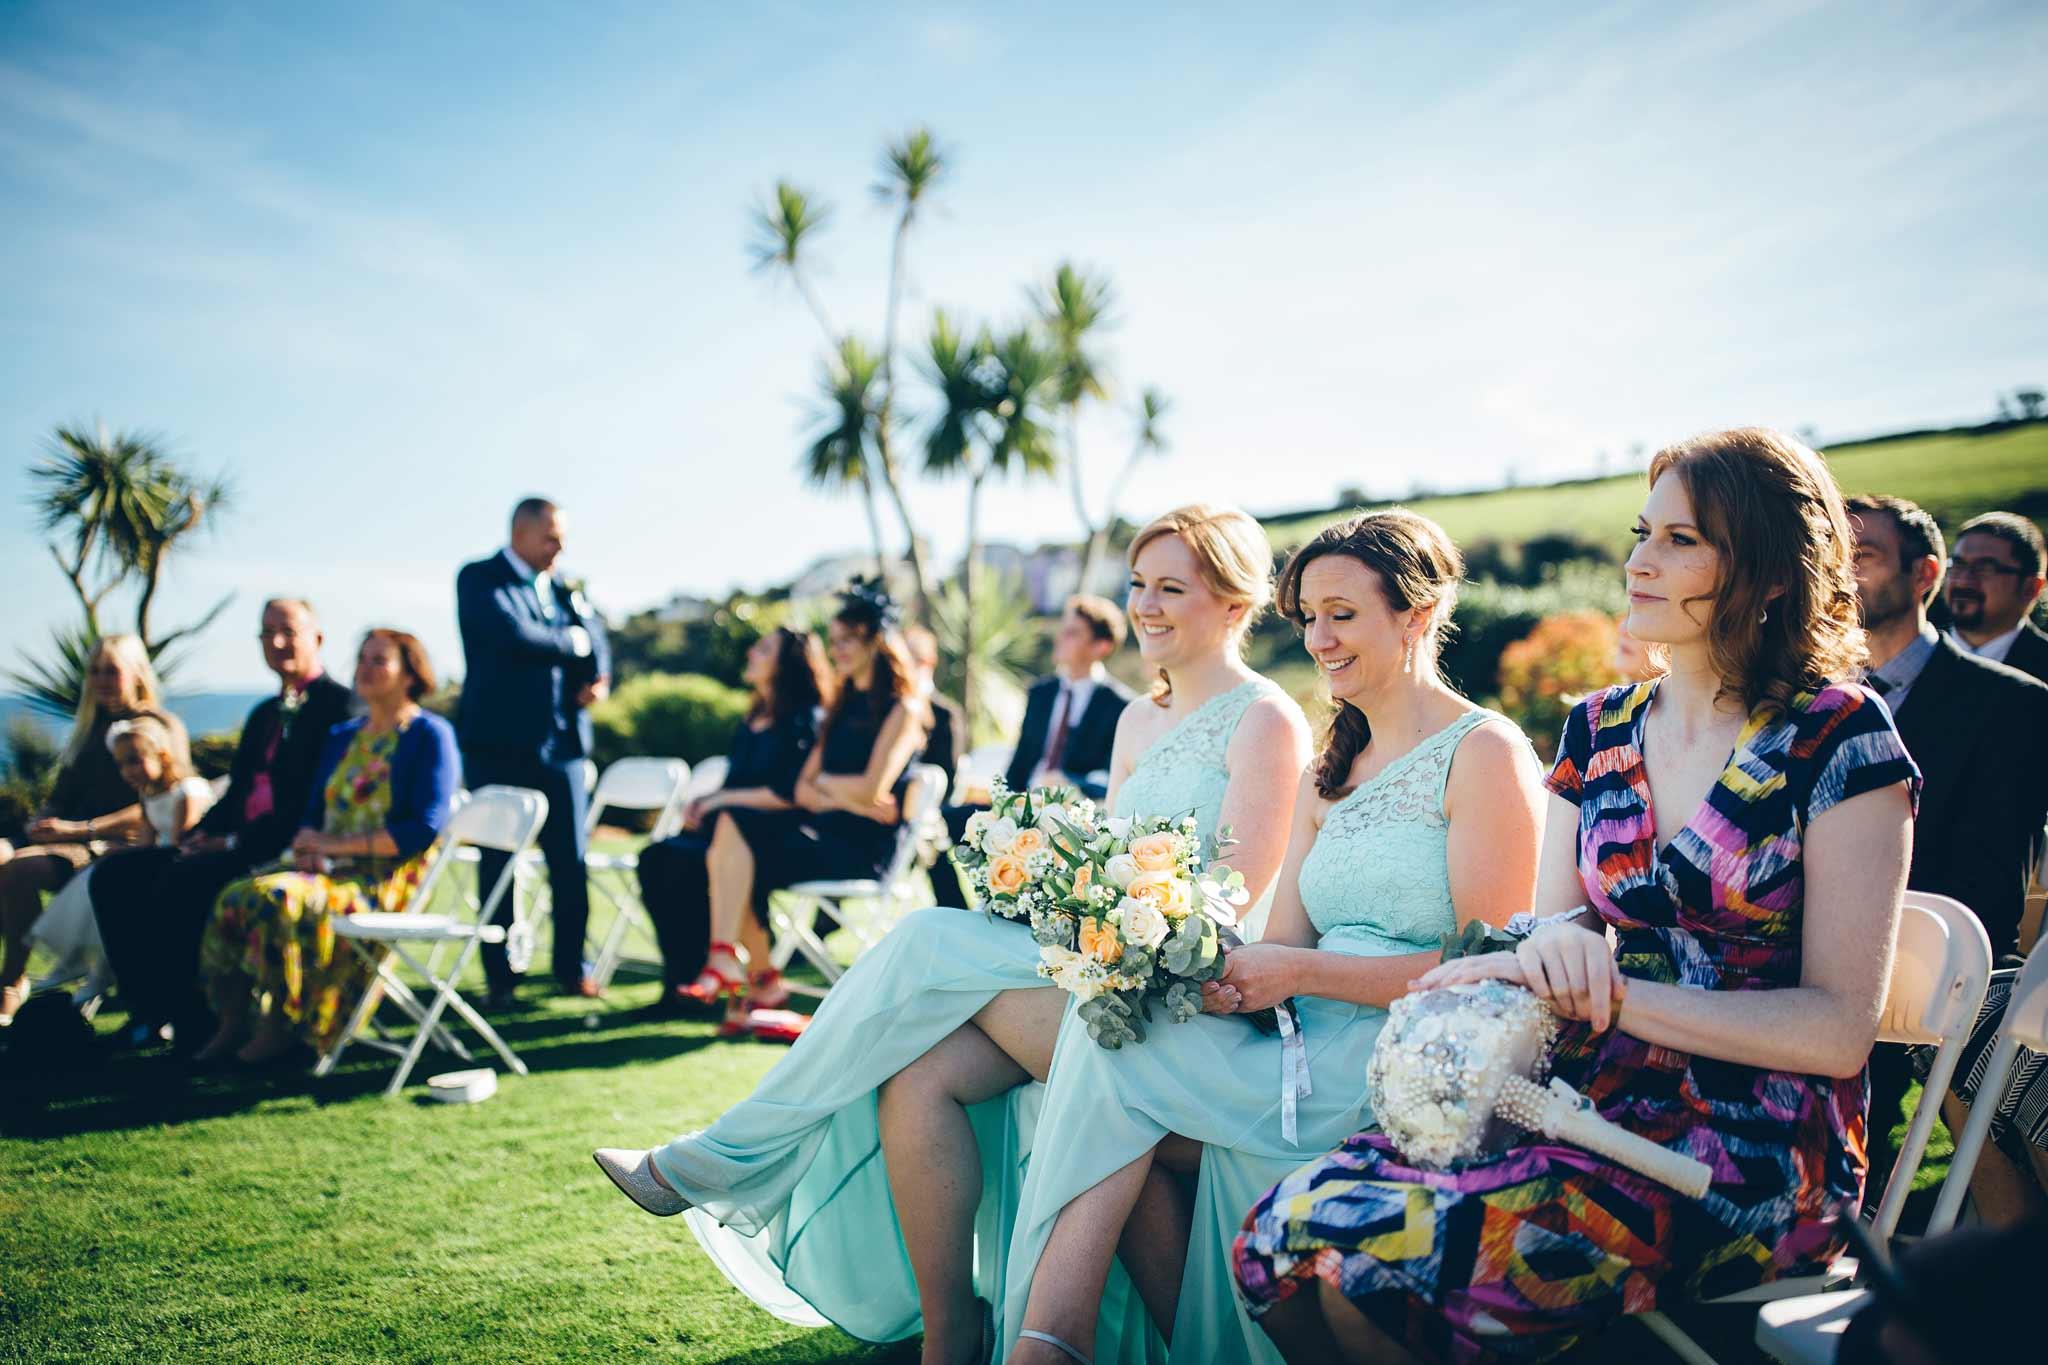 Polpier and Penpol Wedding Photographer 26